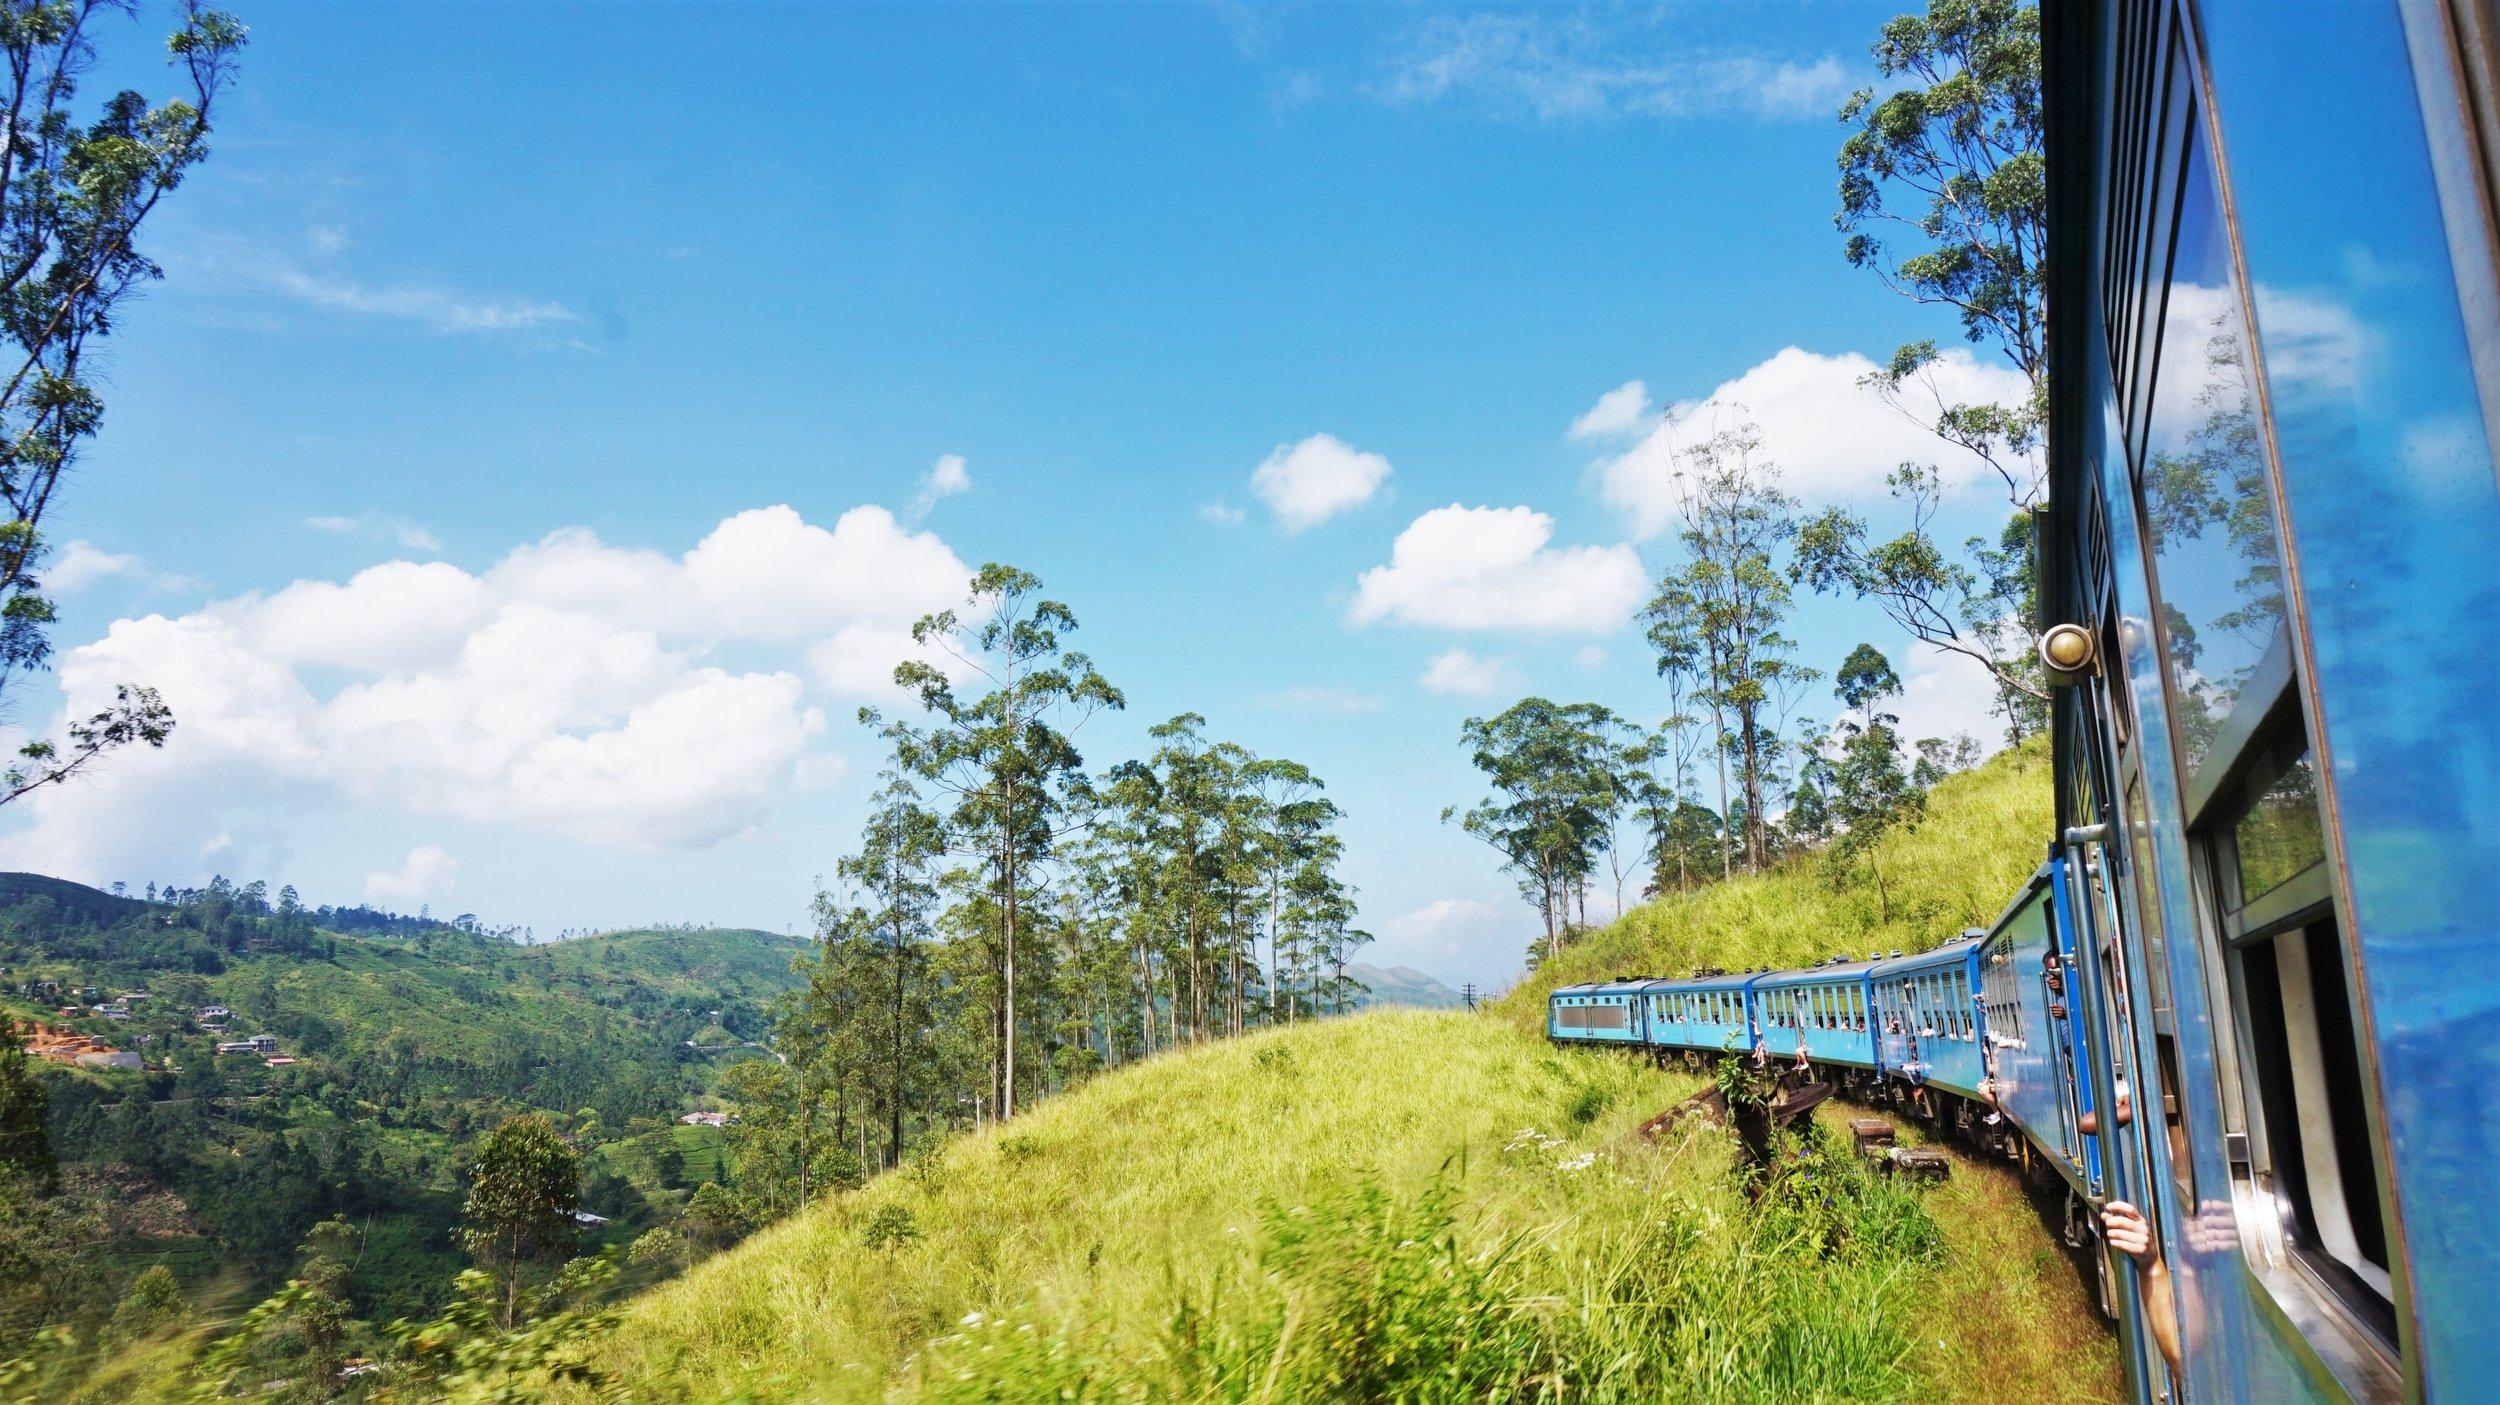 Take a Hill Sri Lanka Journey on the Rail Tracks 3